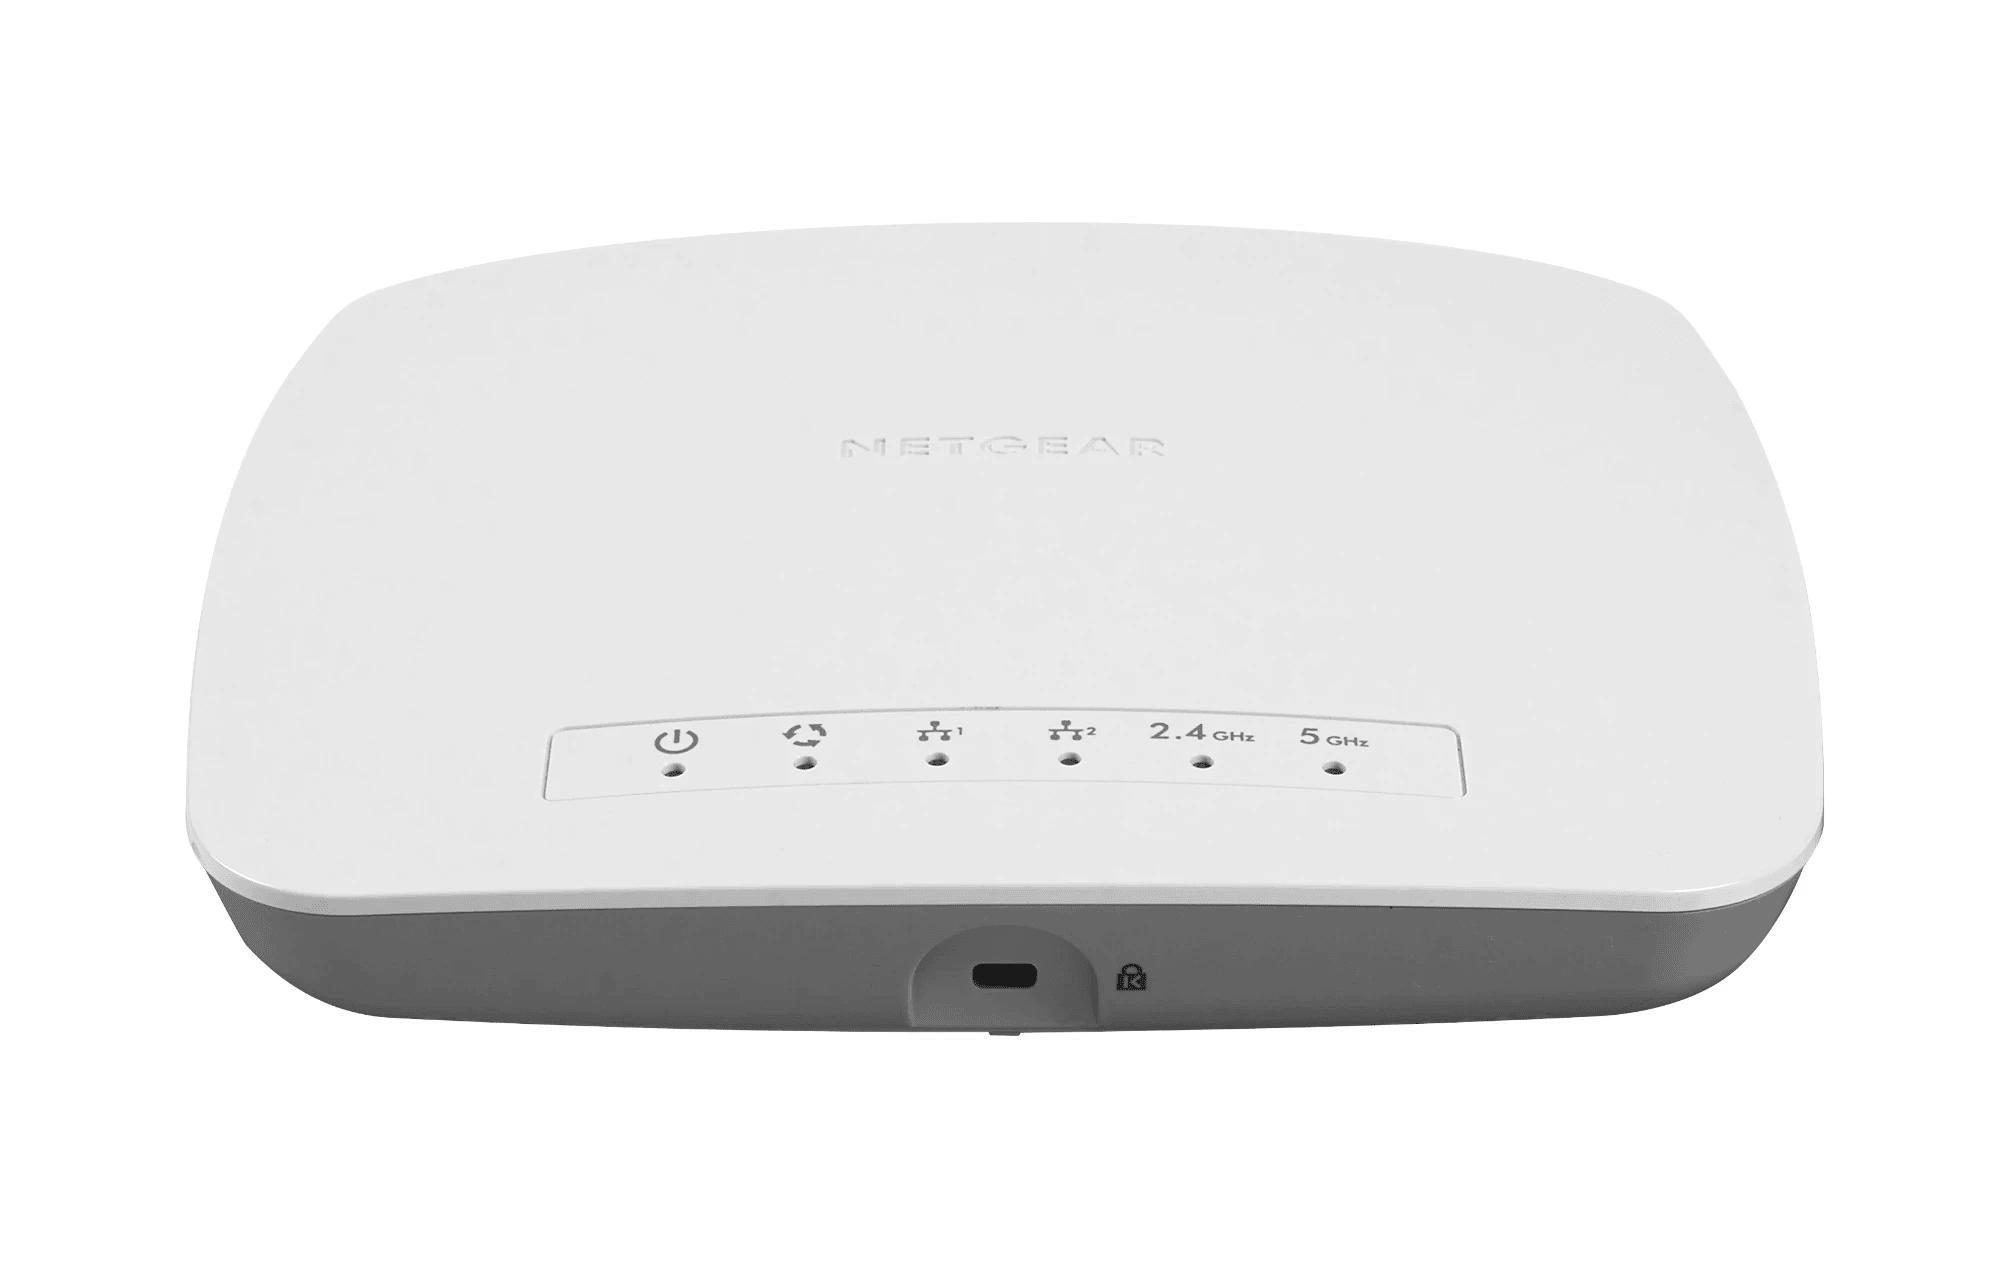 Netgear WAC510 1200 Mbit/s Power over Ethernet (PoE) White Netgear WAC510 1200 Mbit/s Power over Ethernet (PoE) White